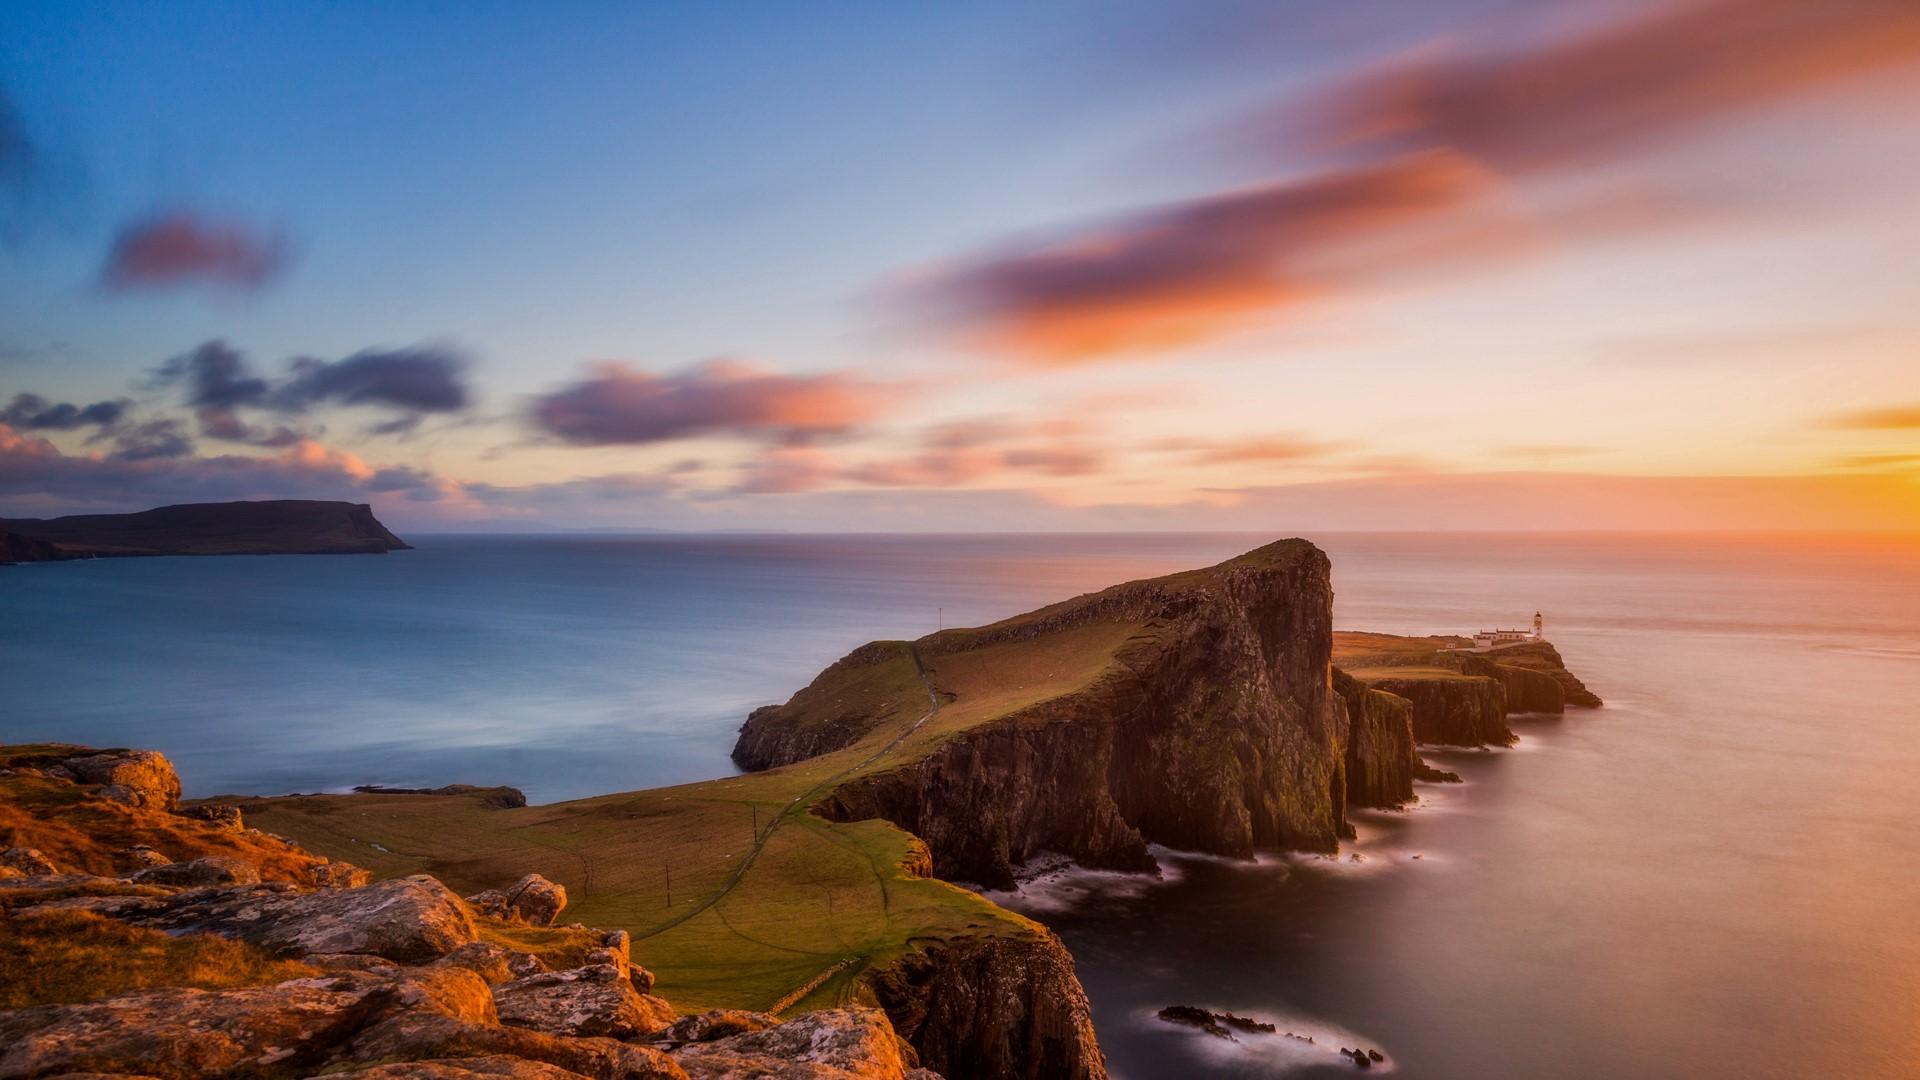 General 1920x1080 nature landscape clouds sky sea water long exposure horizon sunset rocks grass Skye Scotland UK far view lighthouse